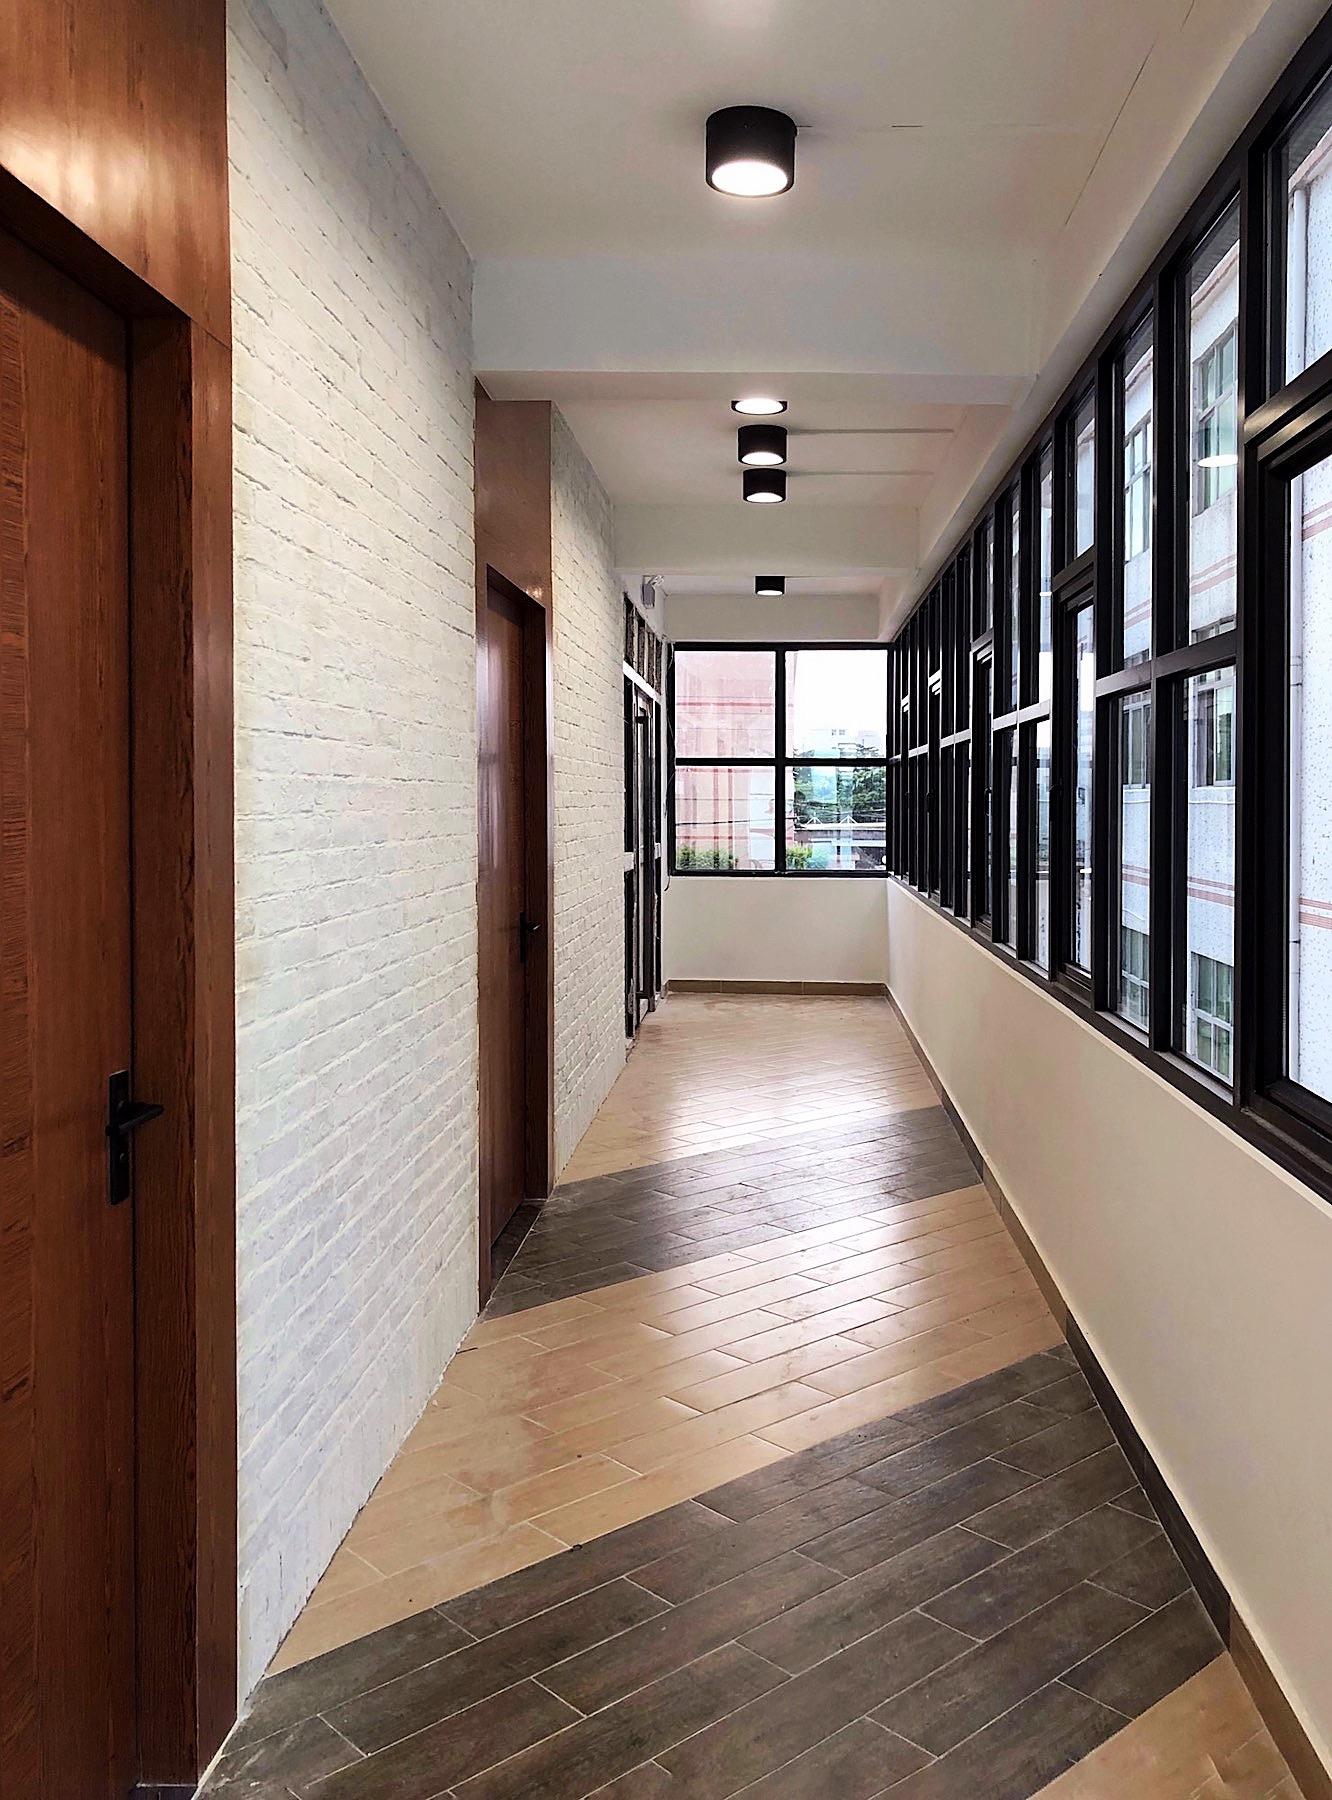 Grandway Office Renovation 2018 2nd Floor Boss Room Corridor 003